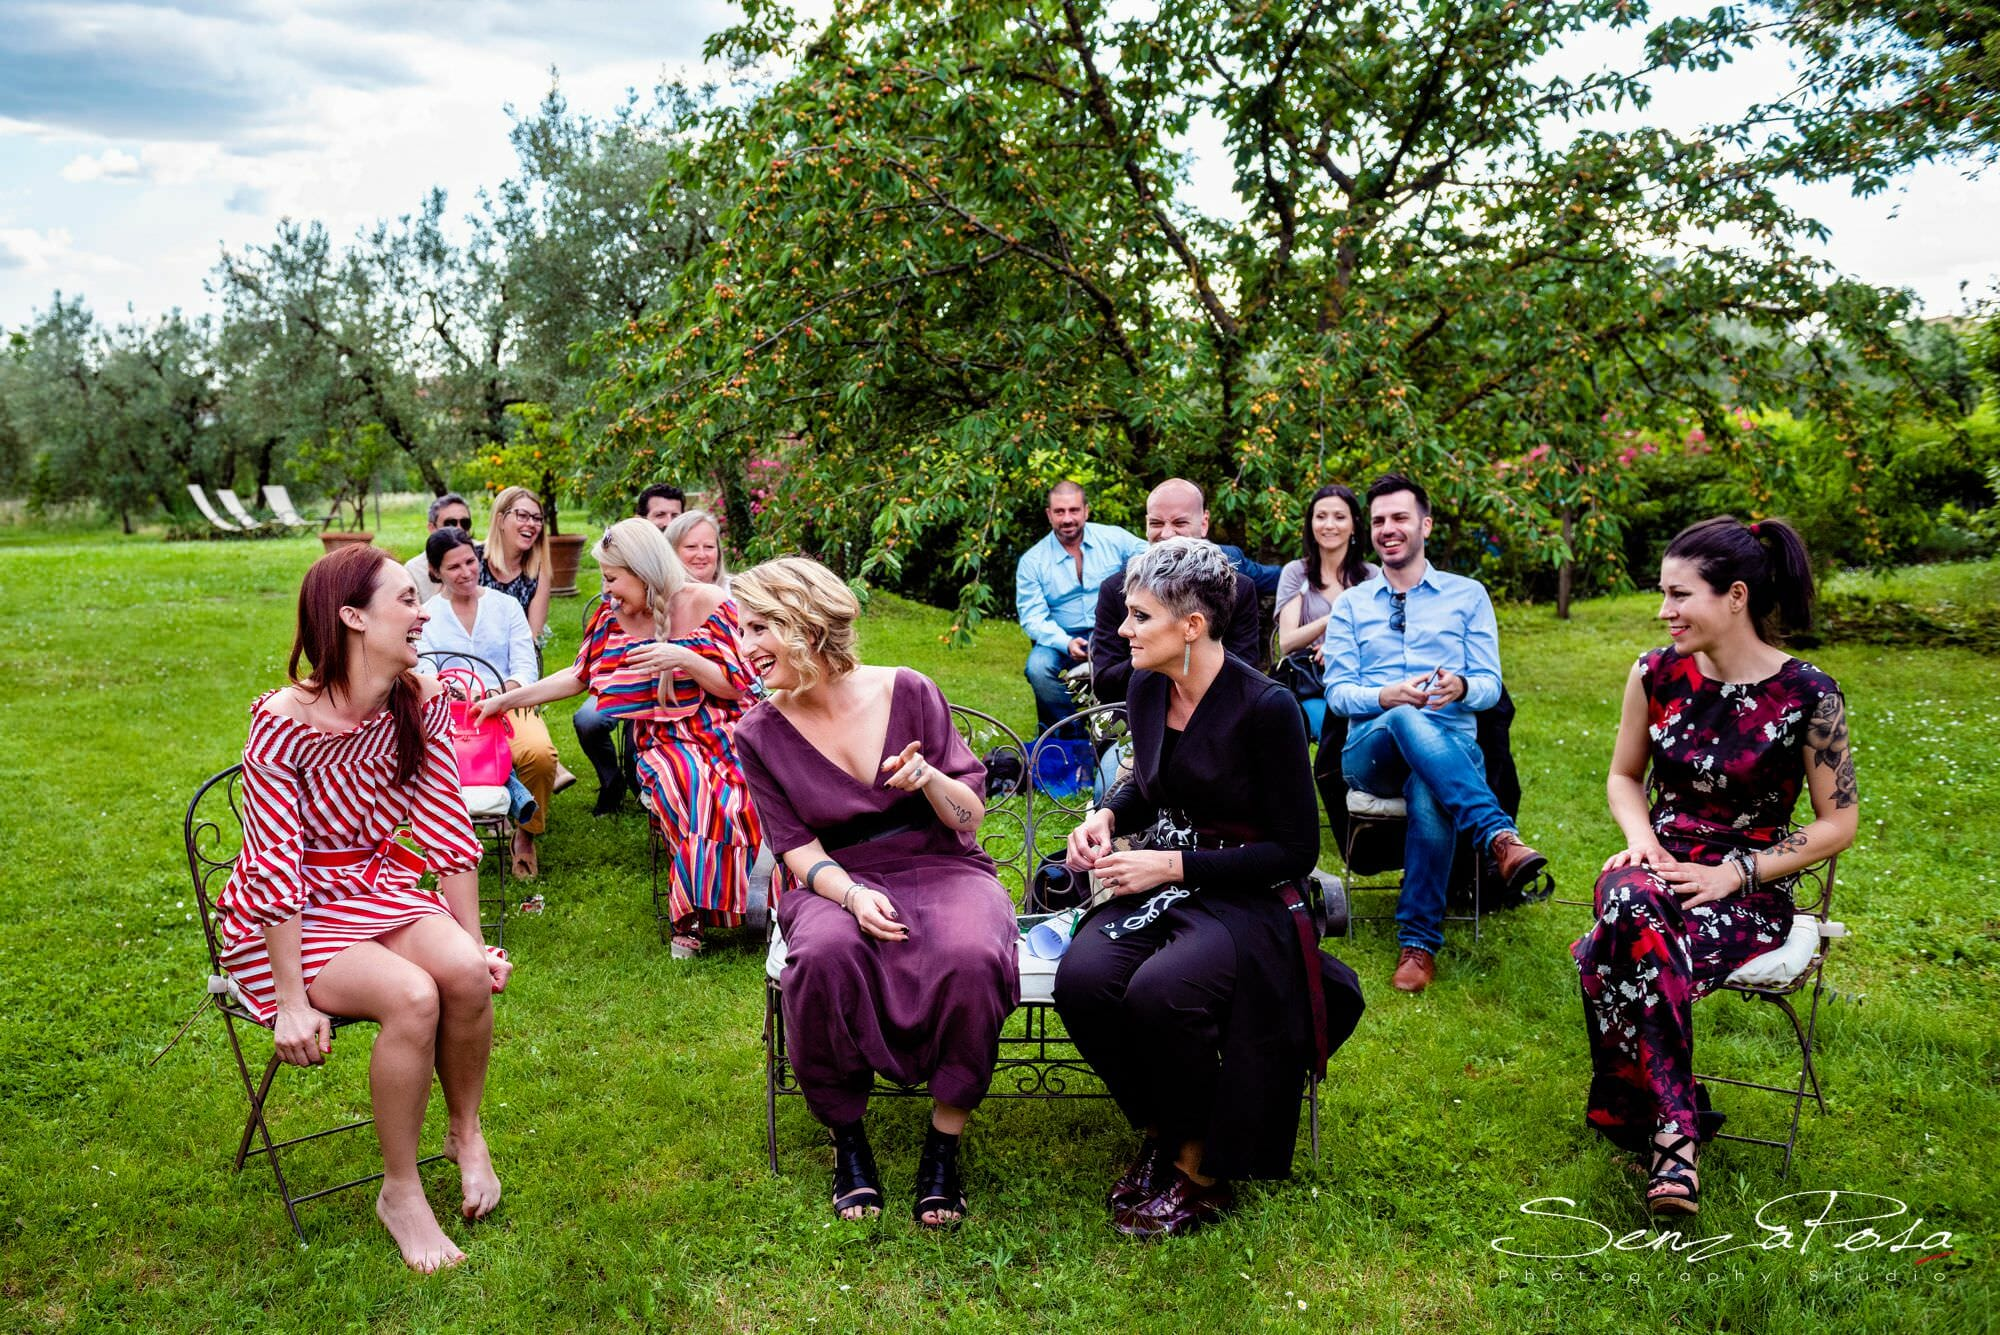 fotografo per matrimoni samesex in toscana